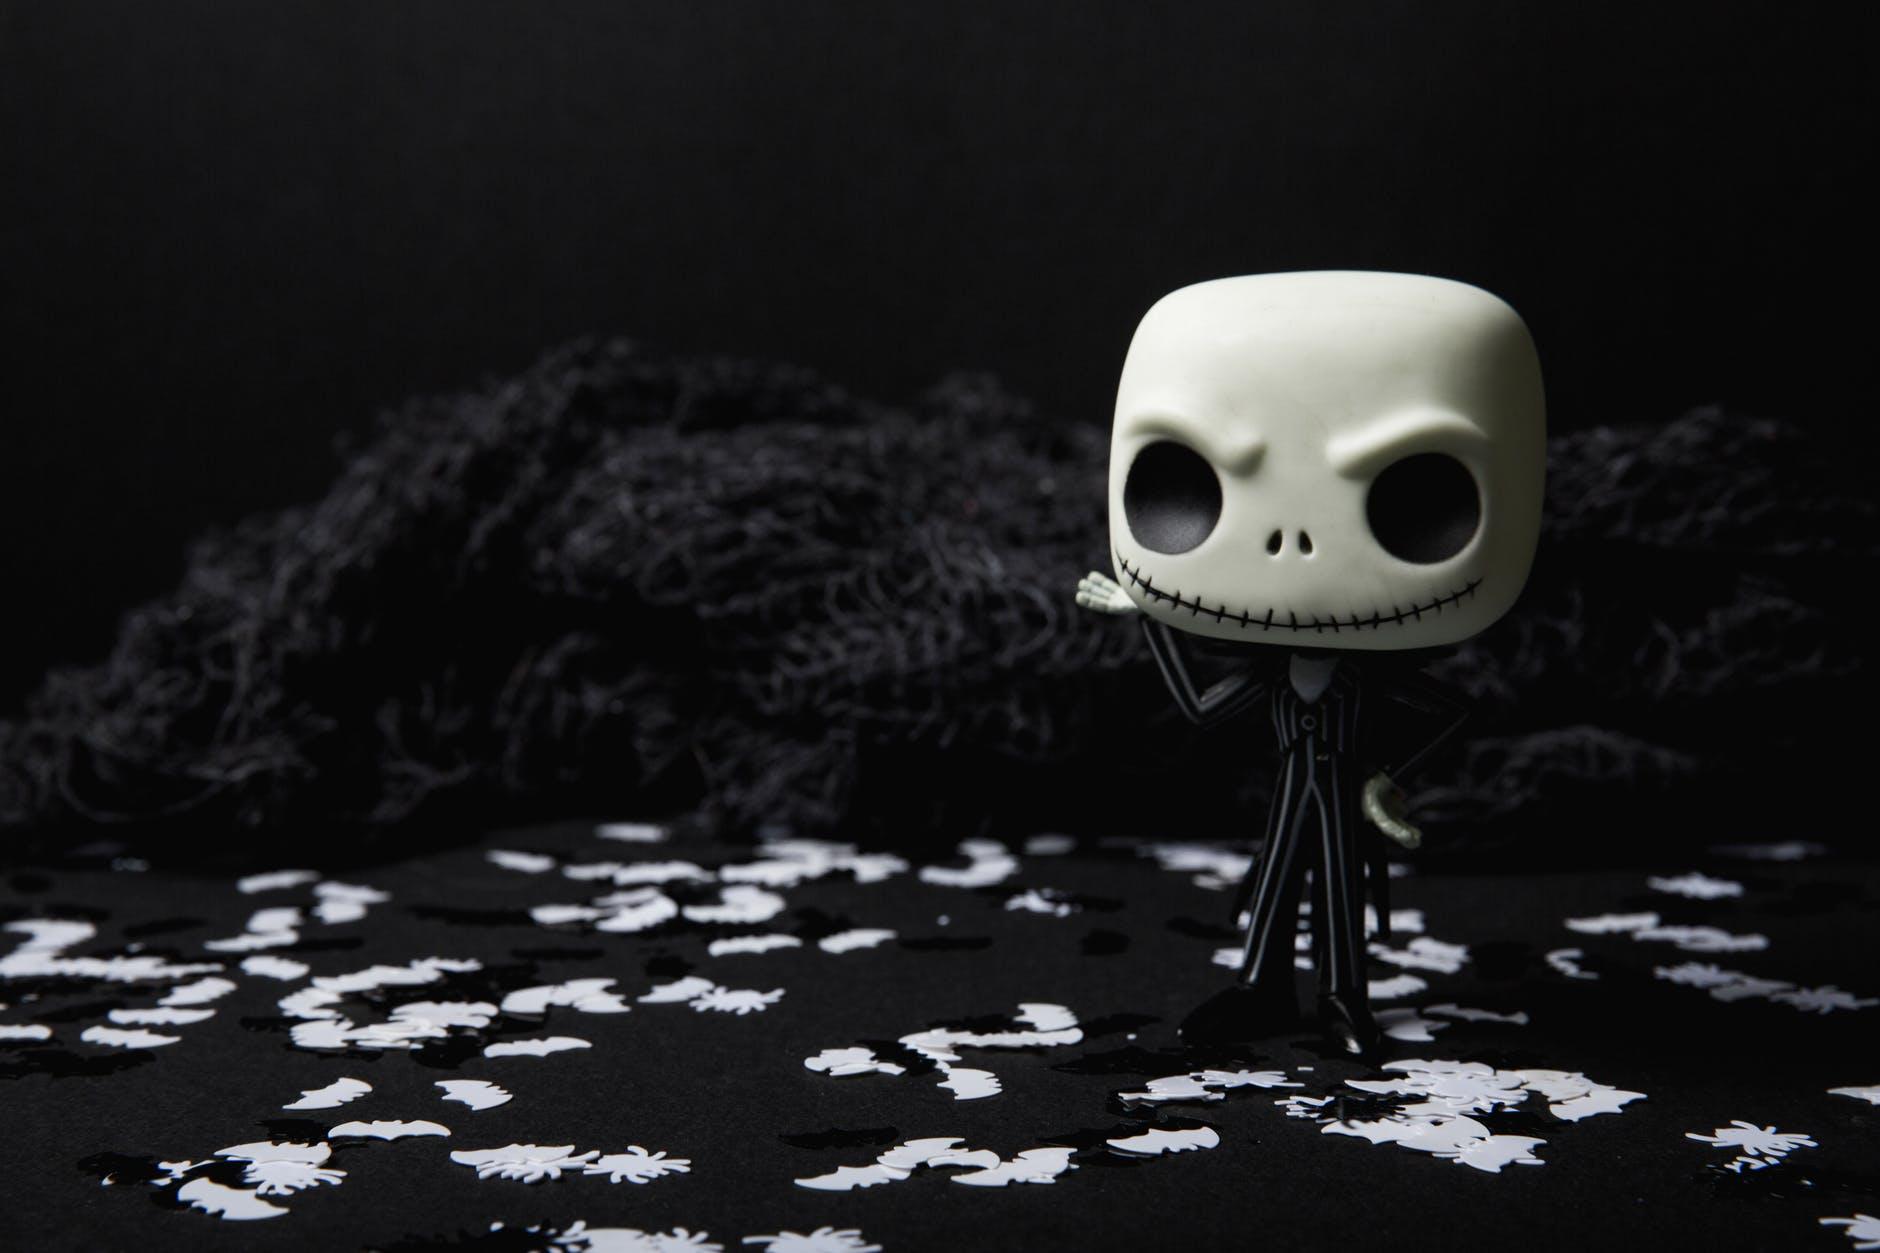 Quarantine Halloween ideas